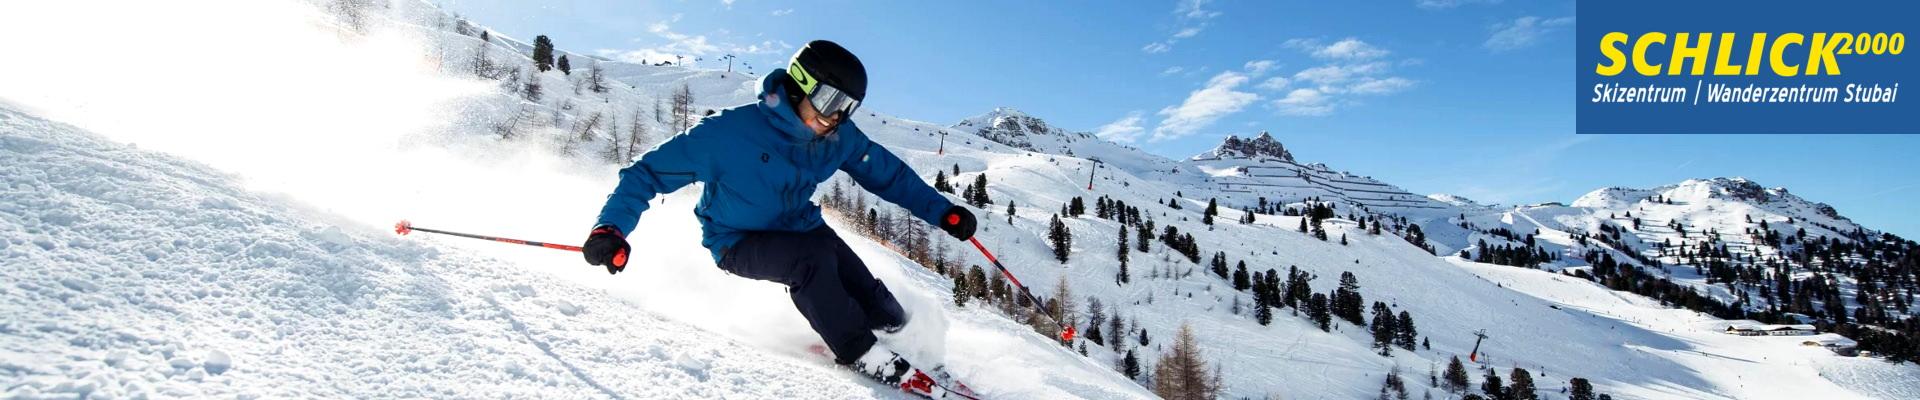 Skier dans le Schlick2000